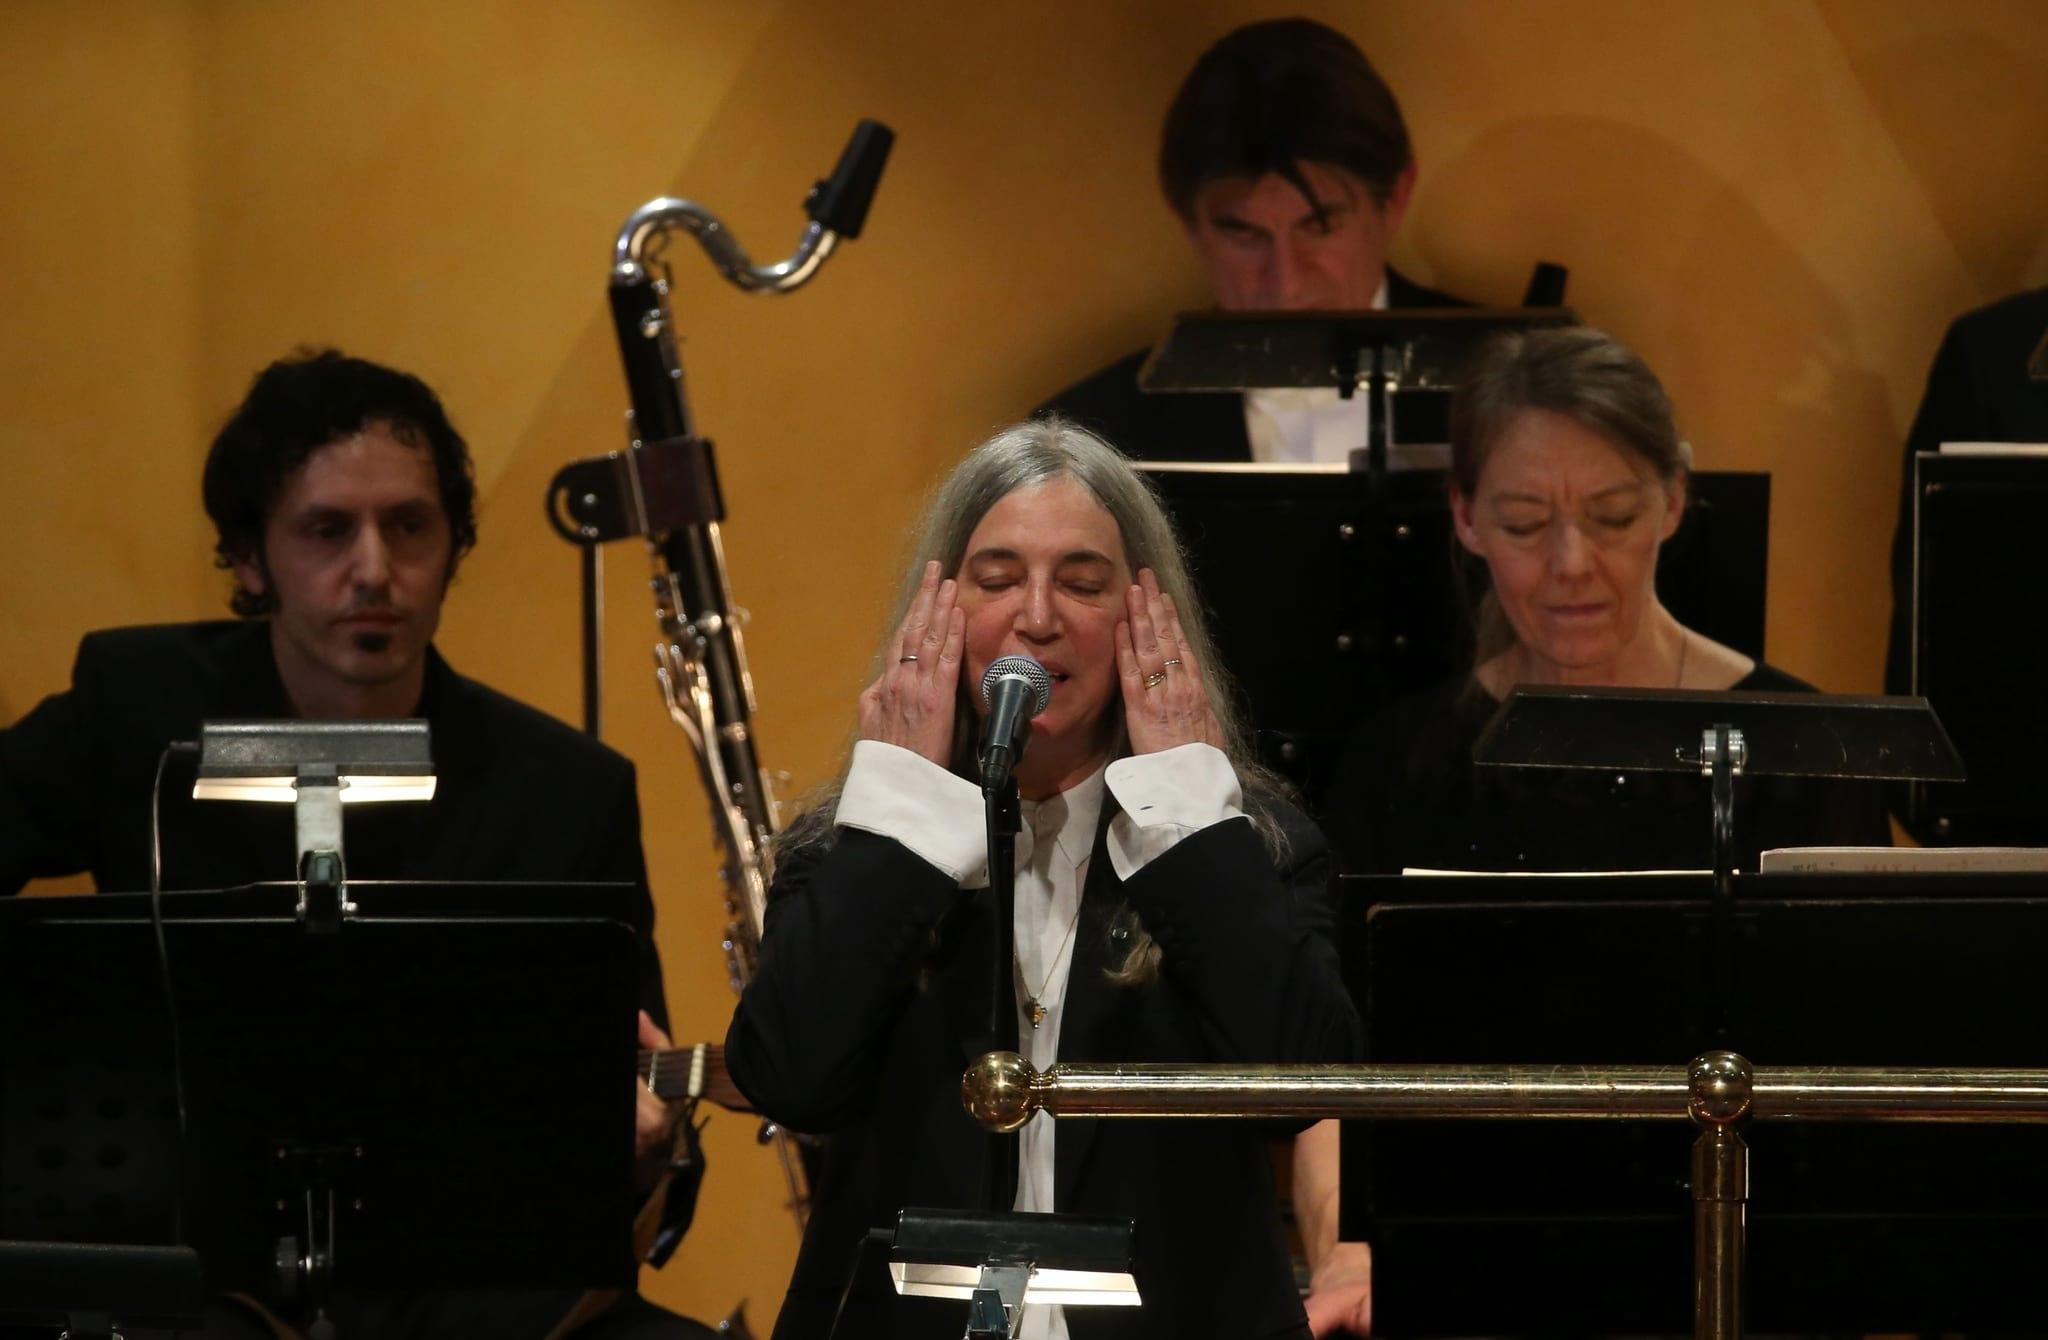 PÚBLICO - Patti Smith emocionada na cerimónia Nobel interrompe actuação